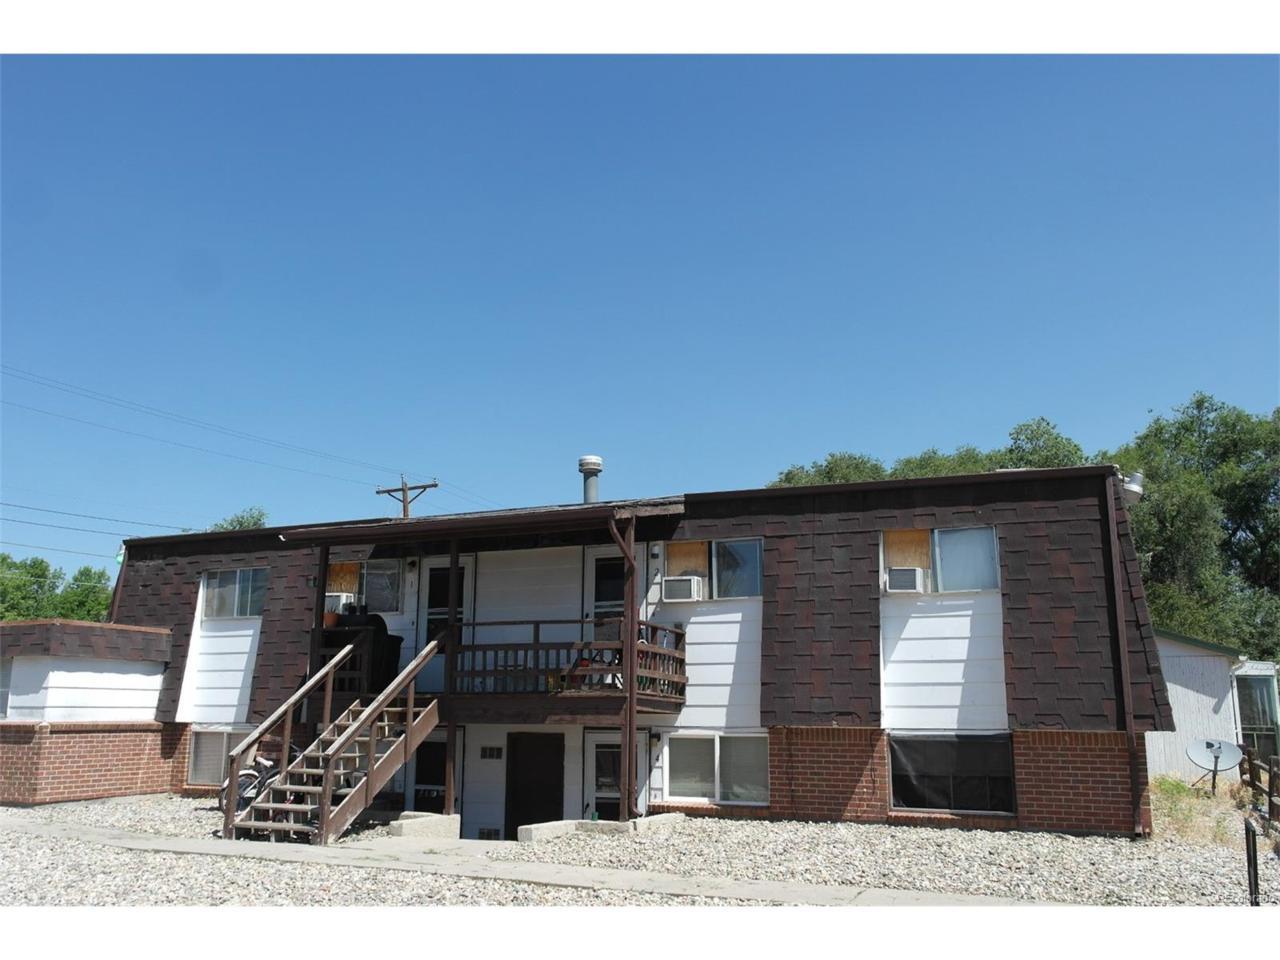 255 N Vine Street, Fountain, CO 80817 (MLS #1912641) :: 8z Real Estate